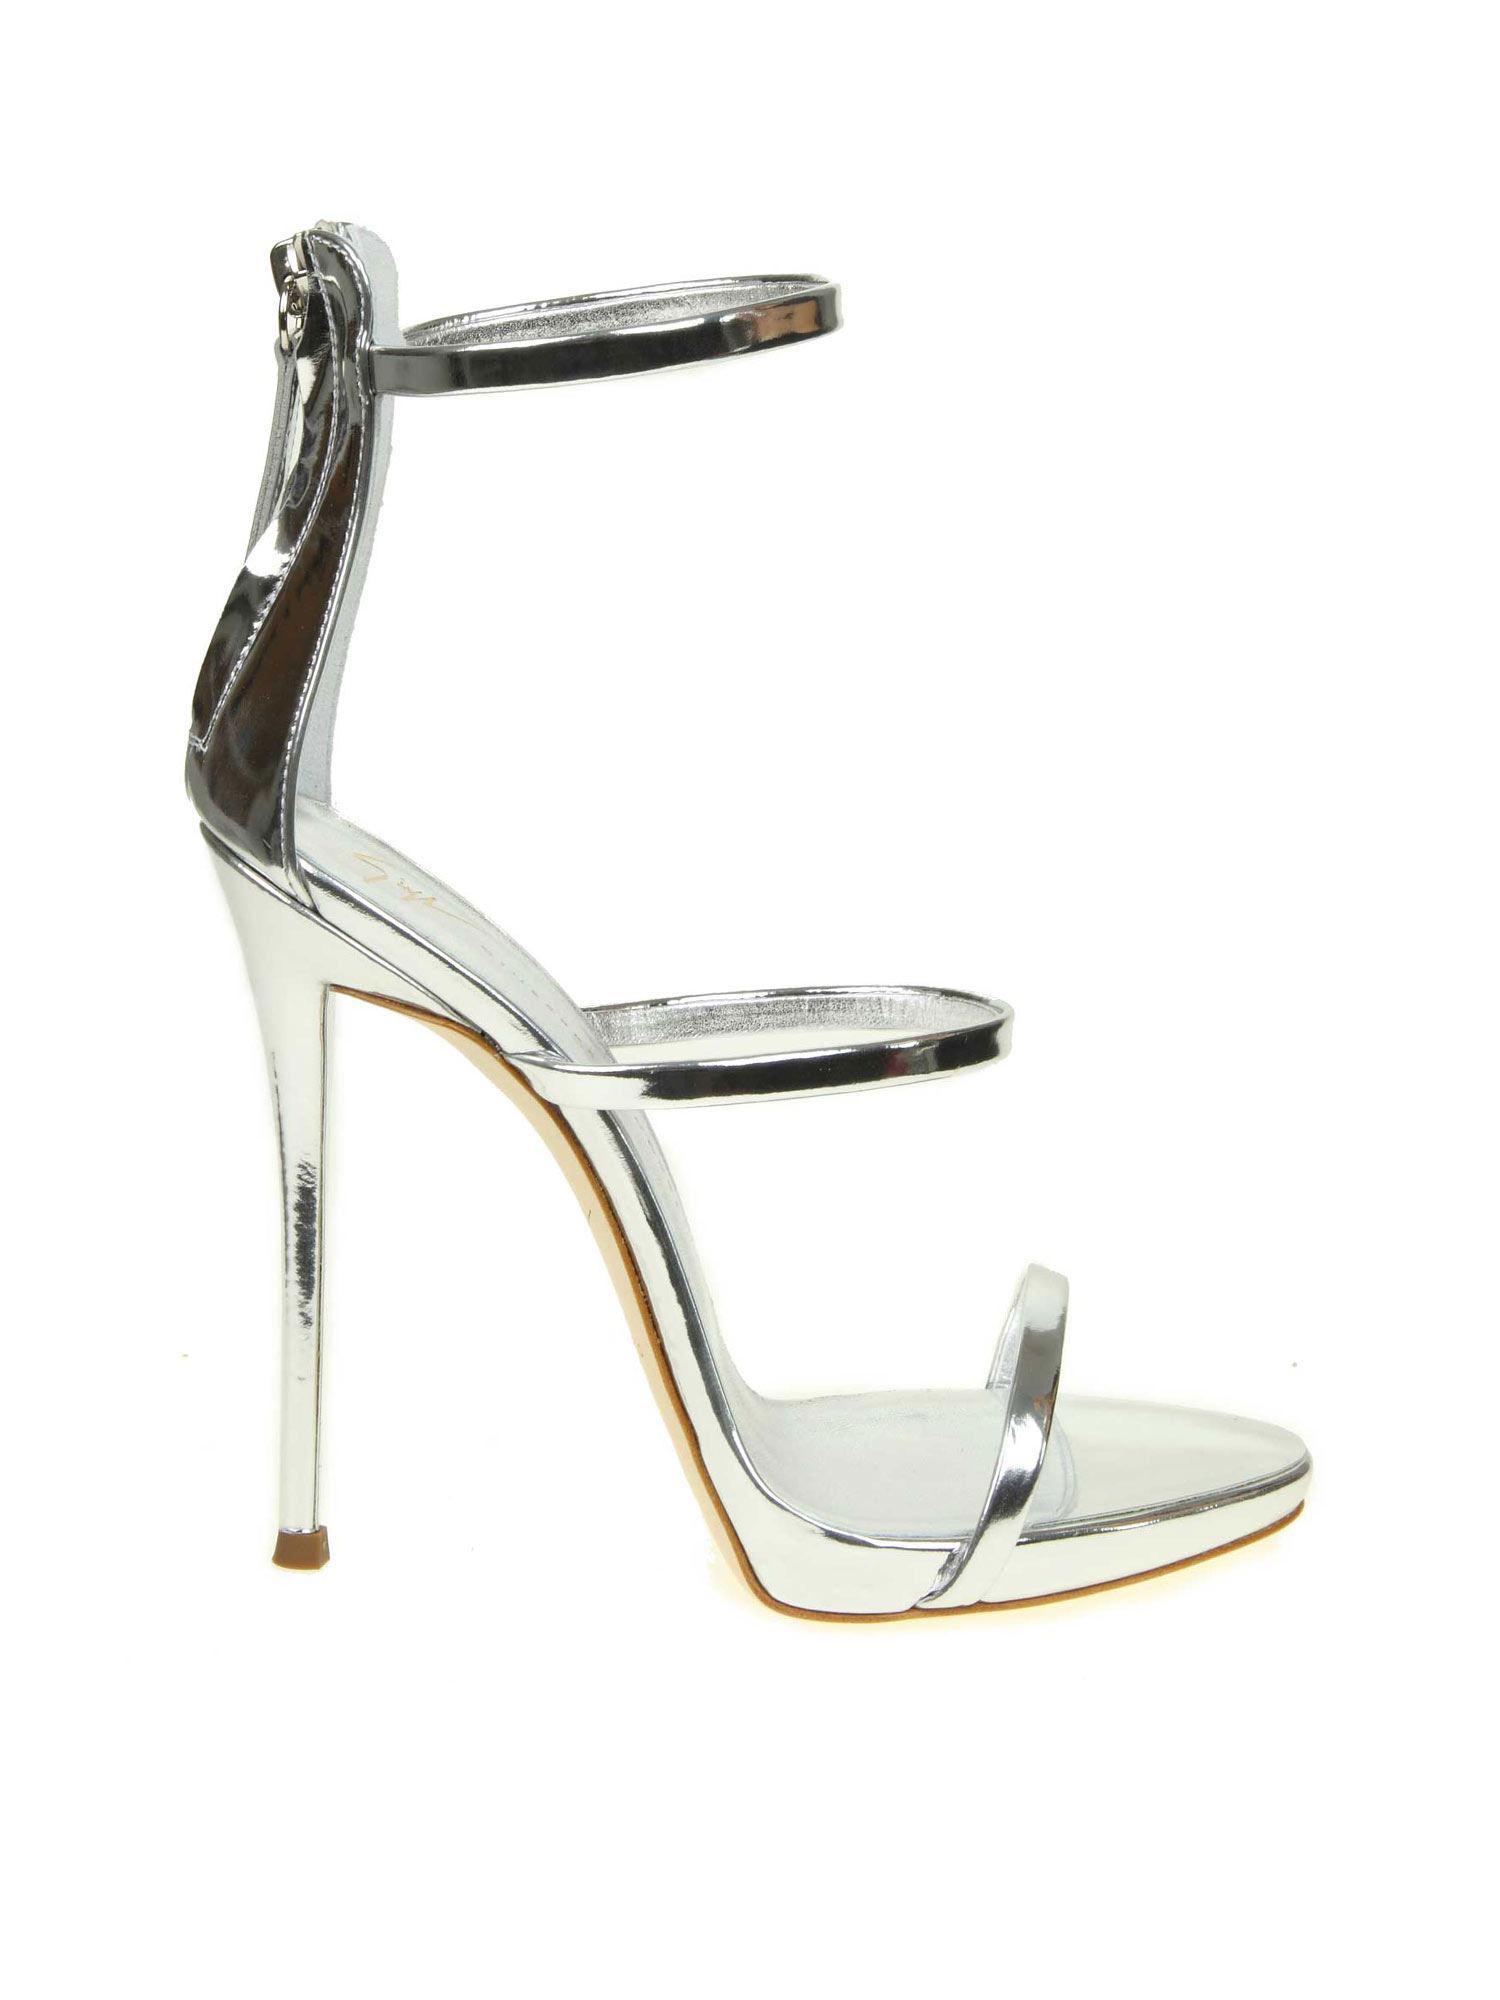 dc5db385d96f Lyst - Giuseppe Zanotti Heeled Sandals Women in Metallic - Save 9%